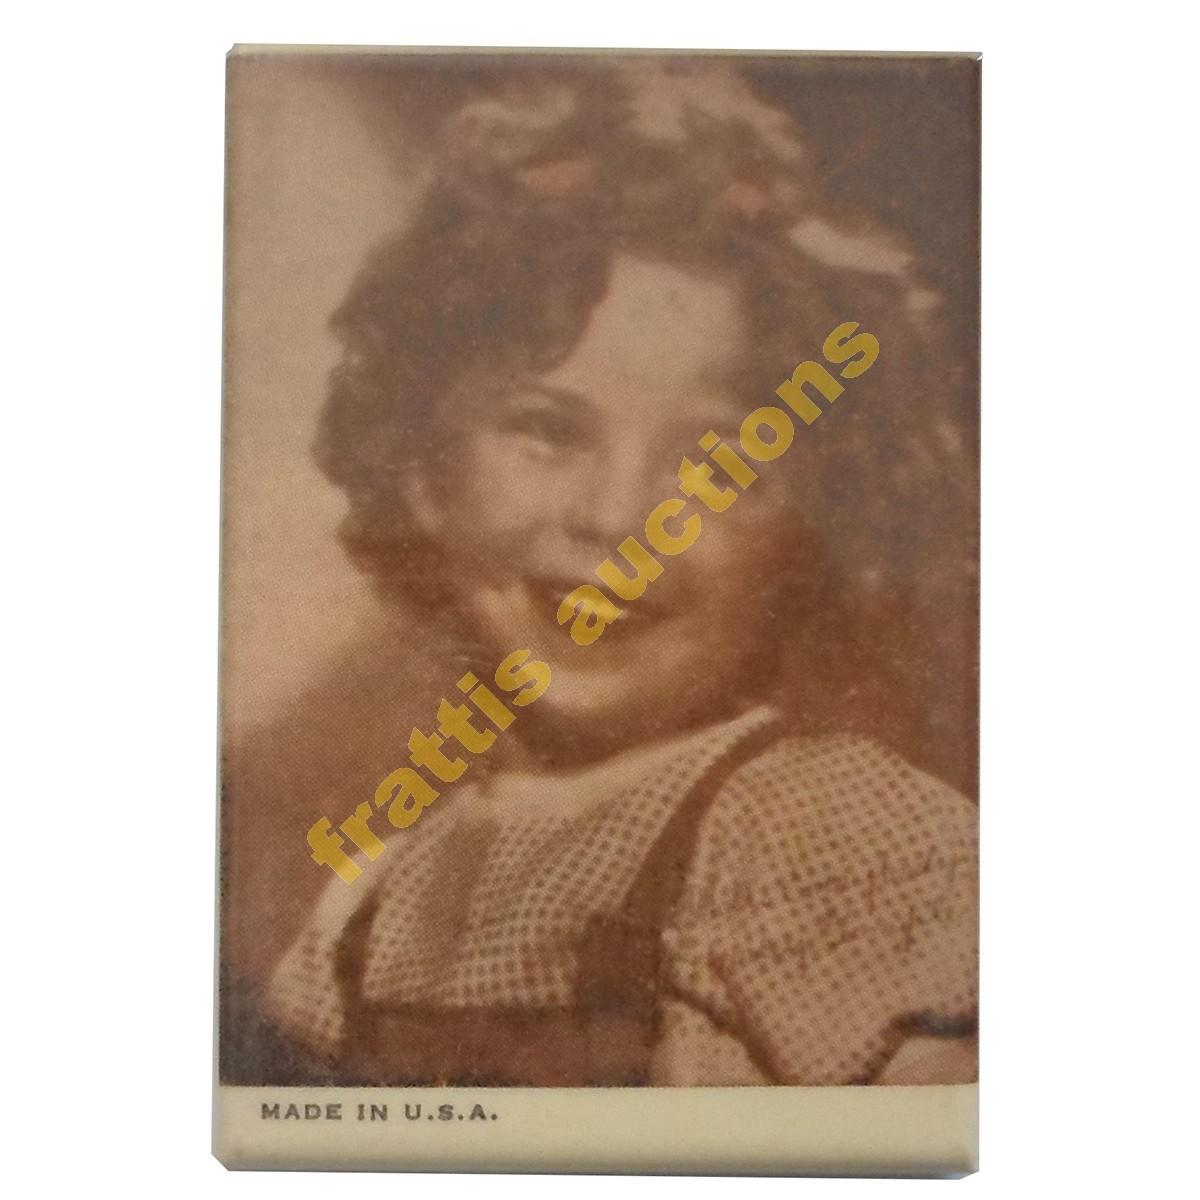 Shirley Temple, Διαφημιστικό καθρεφτάκι.